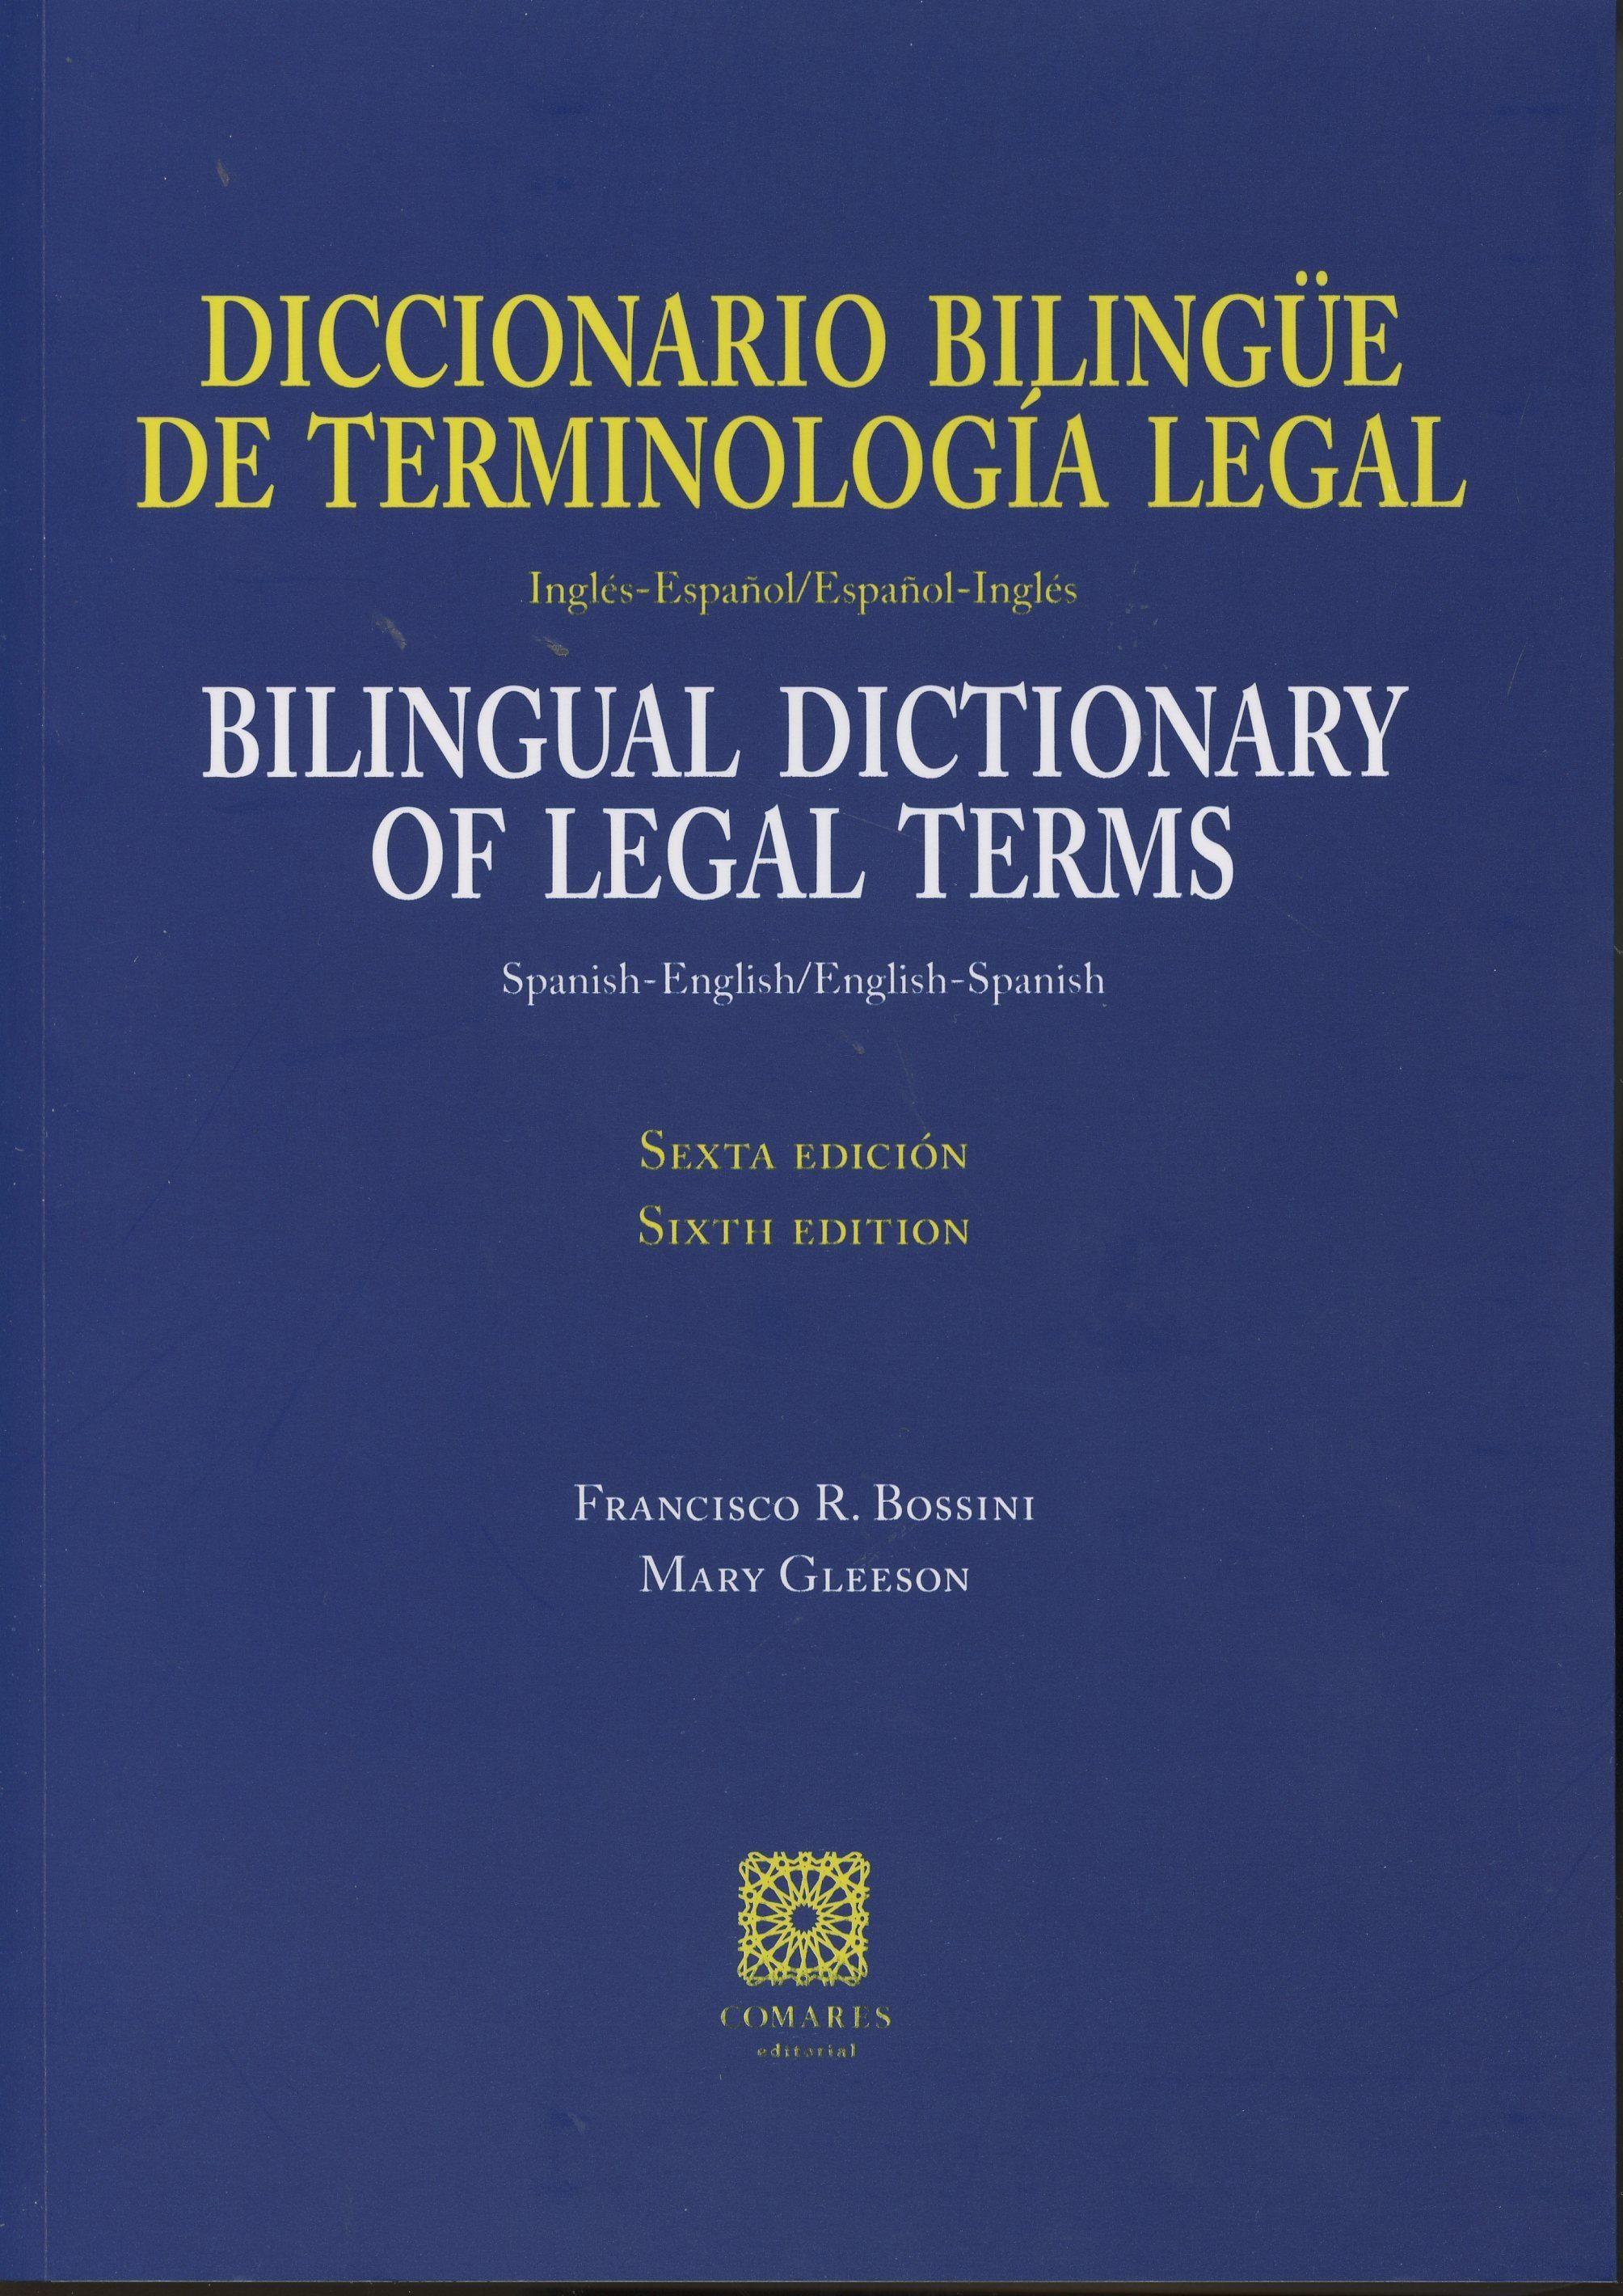 diccionario bilingüe de terminologia legal: ingles-español / español-ingles  = bilingual dictionary